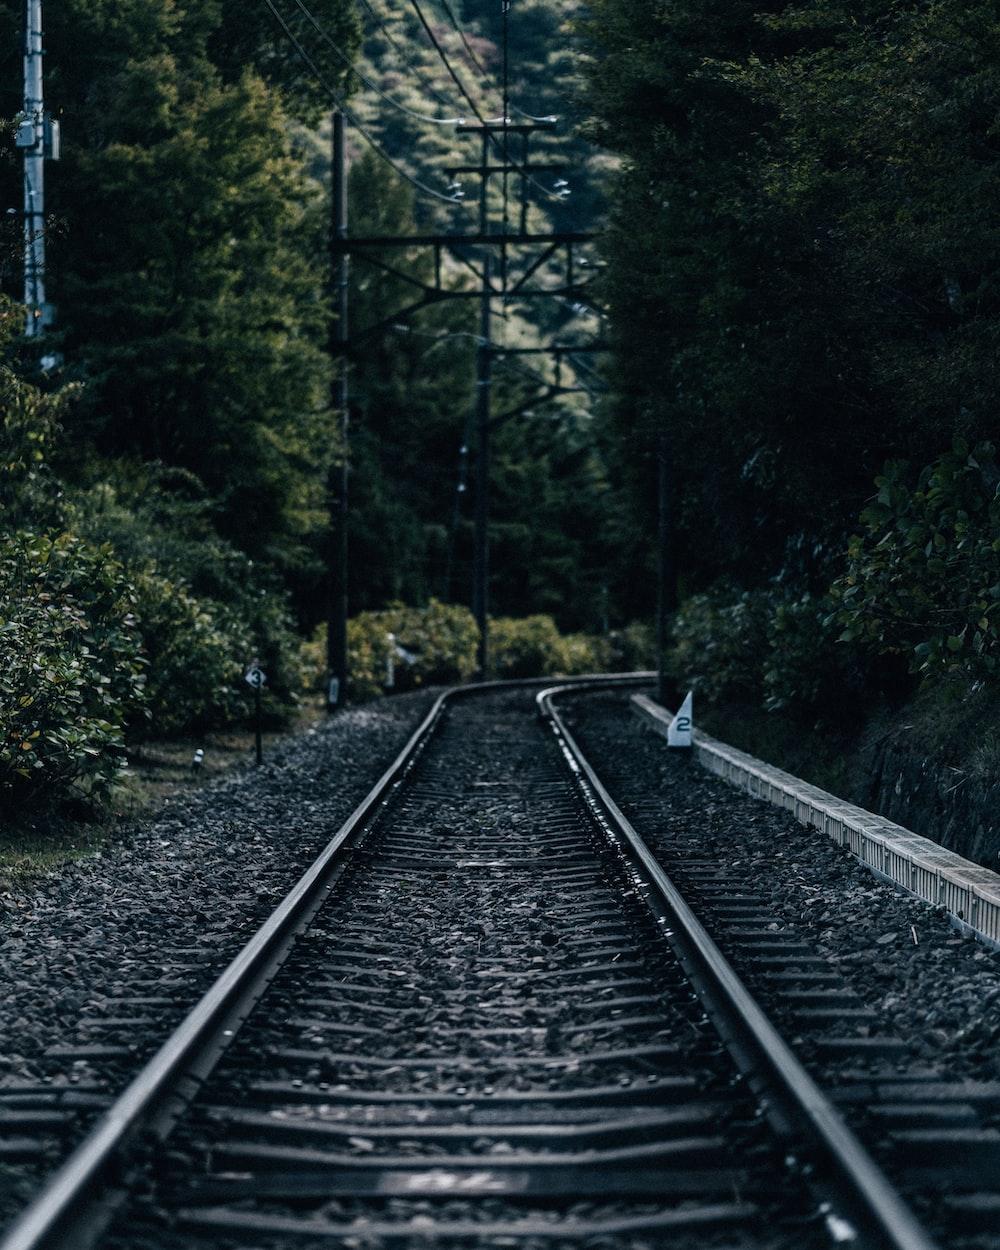 black metal train rail near green trees during daytime